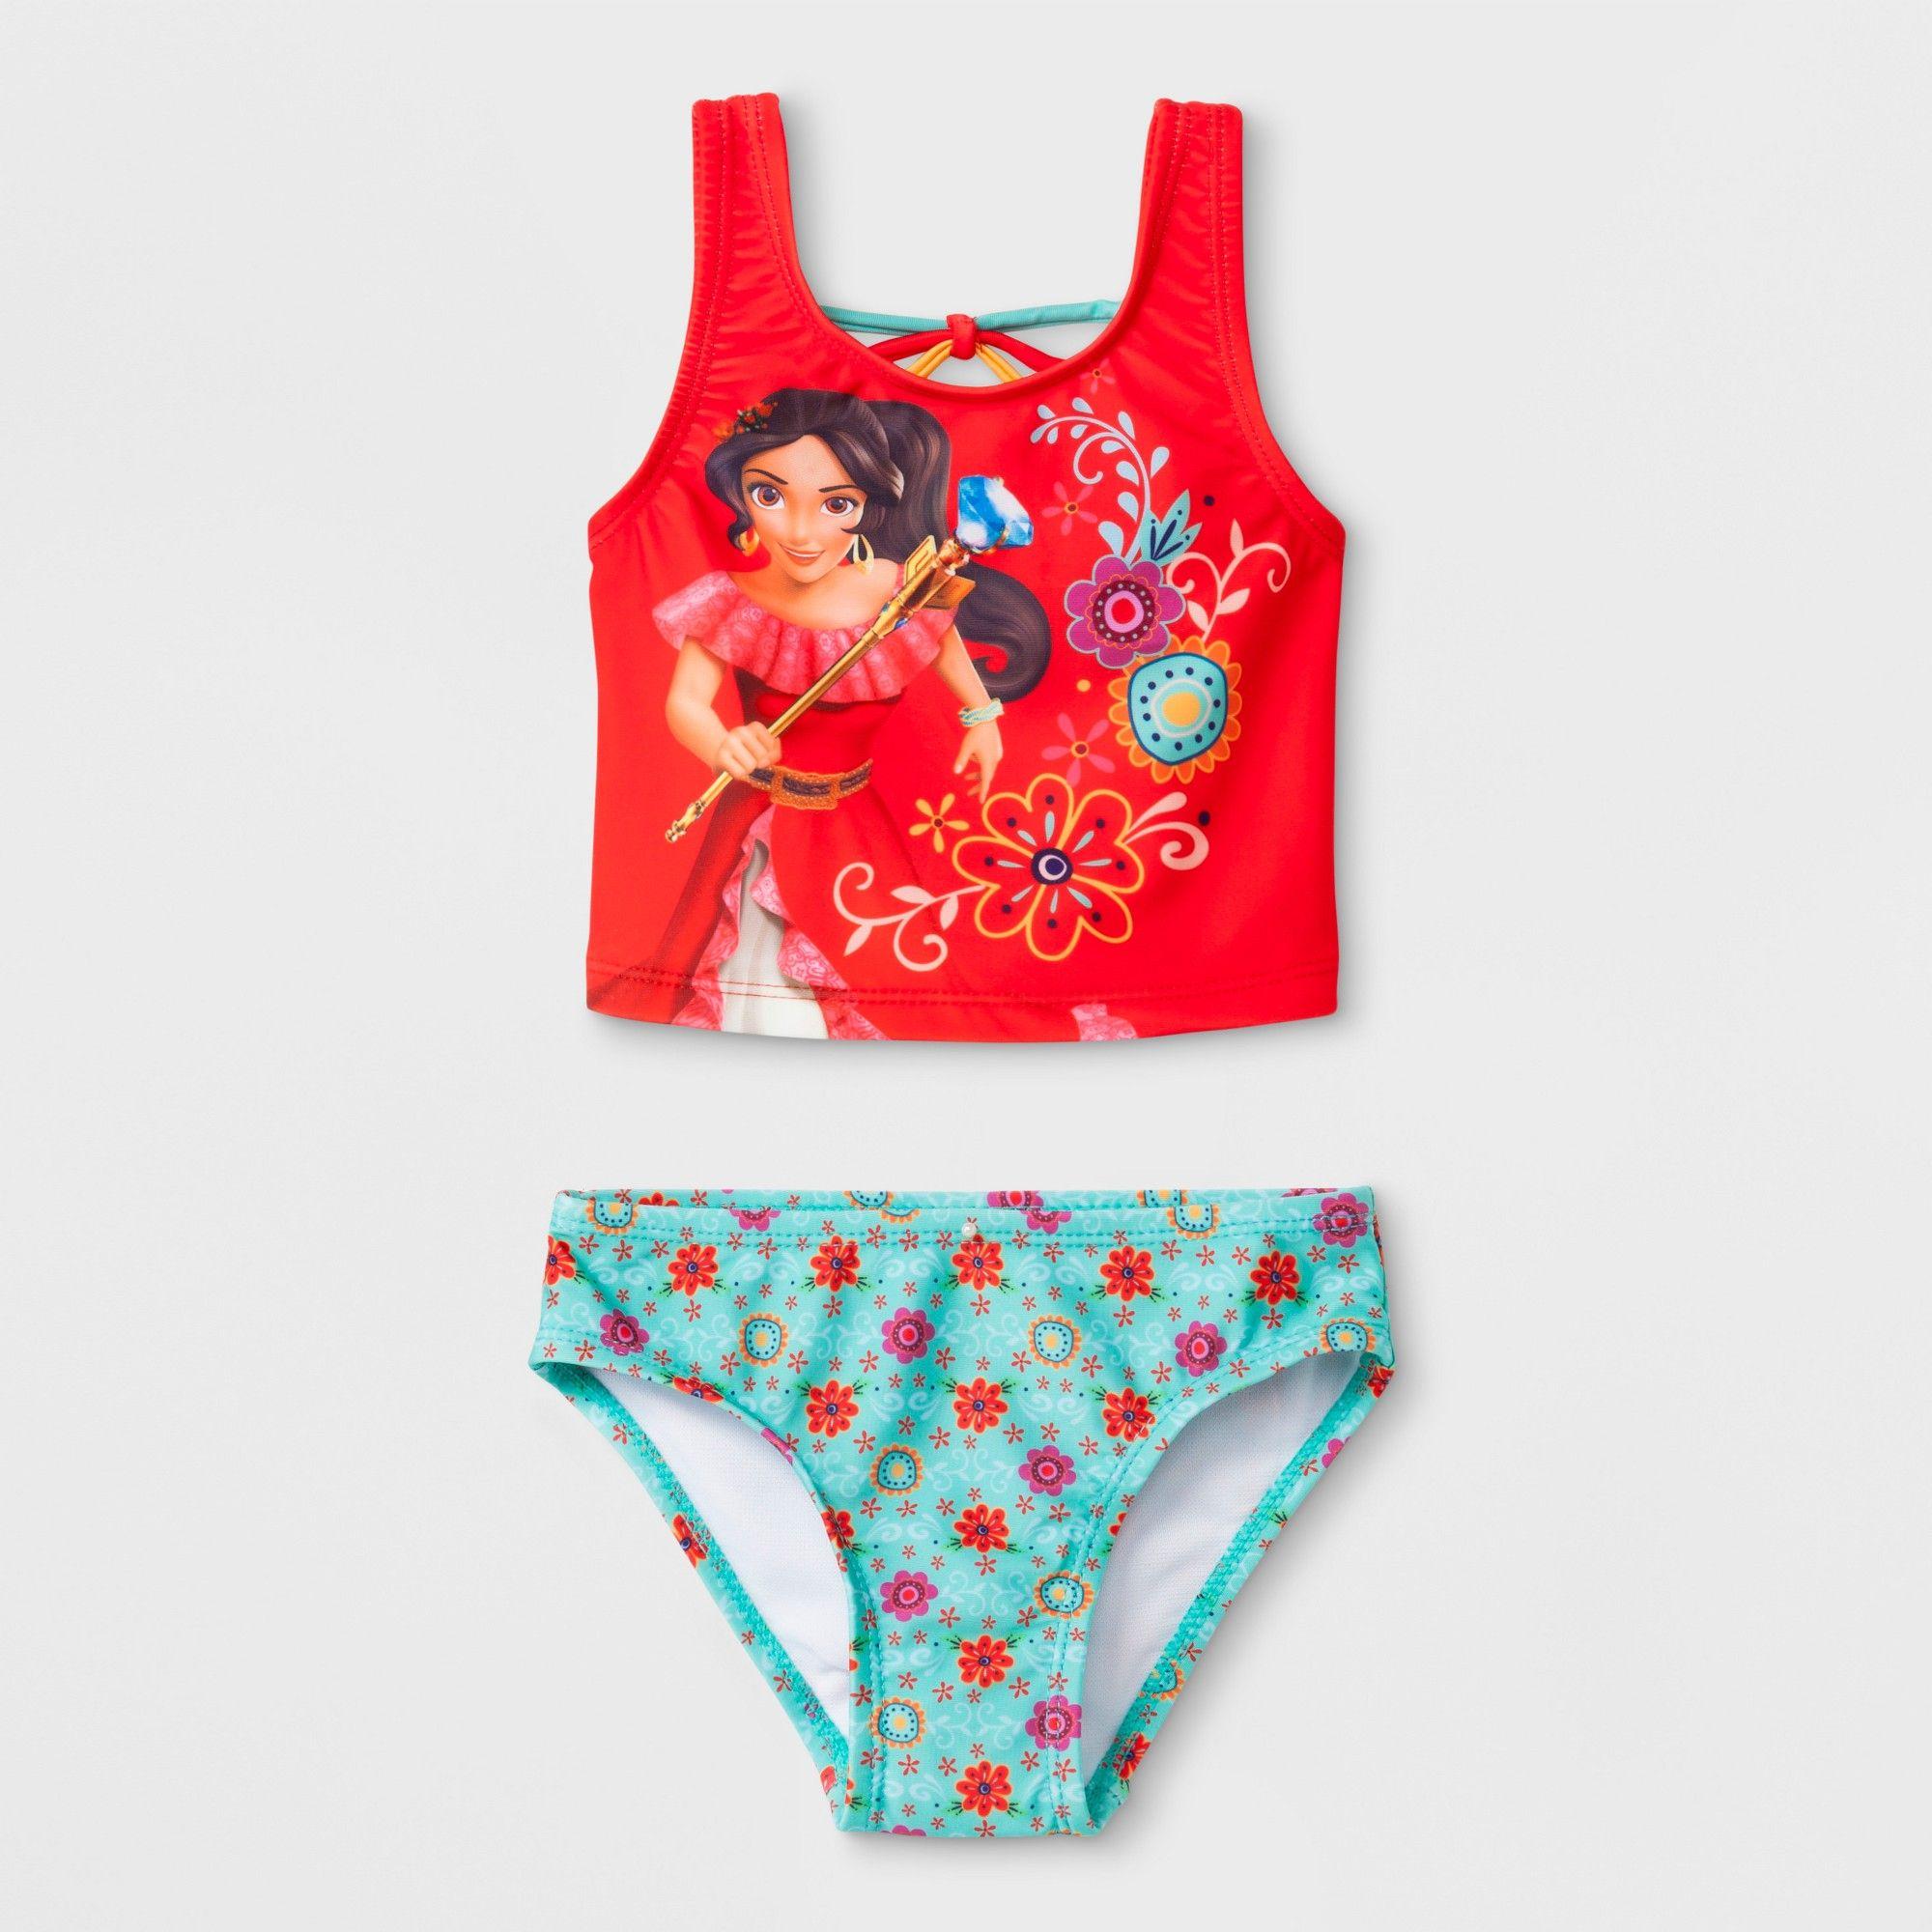 ec1ad777c7 Toddler Girls' Disney Elena of Avalor Tankini Set - Red 3T ...